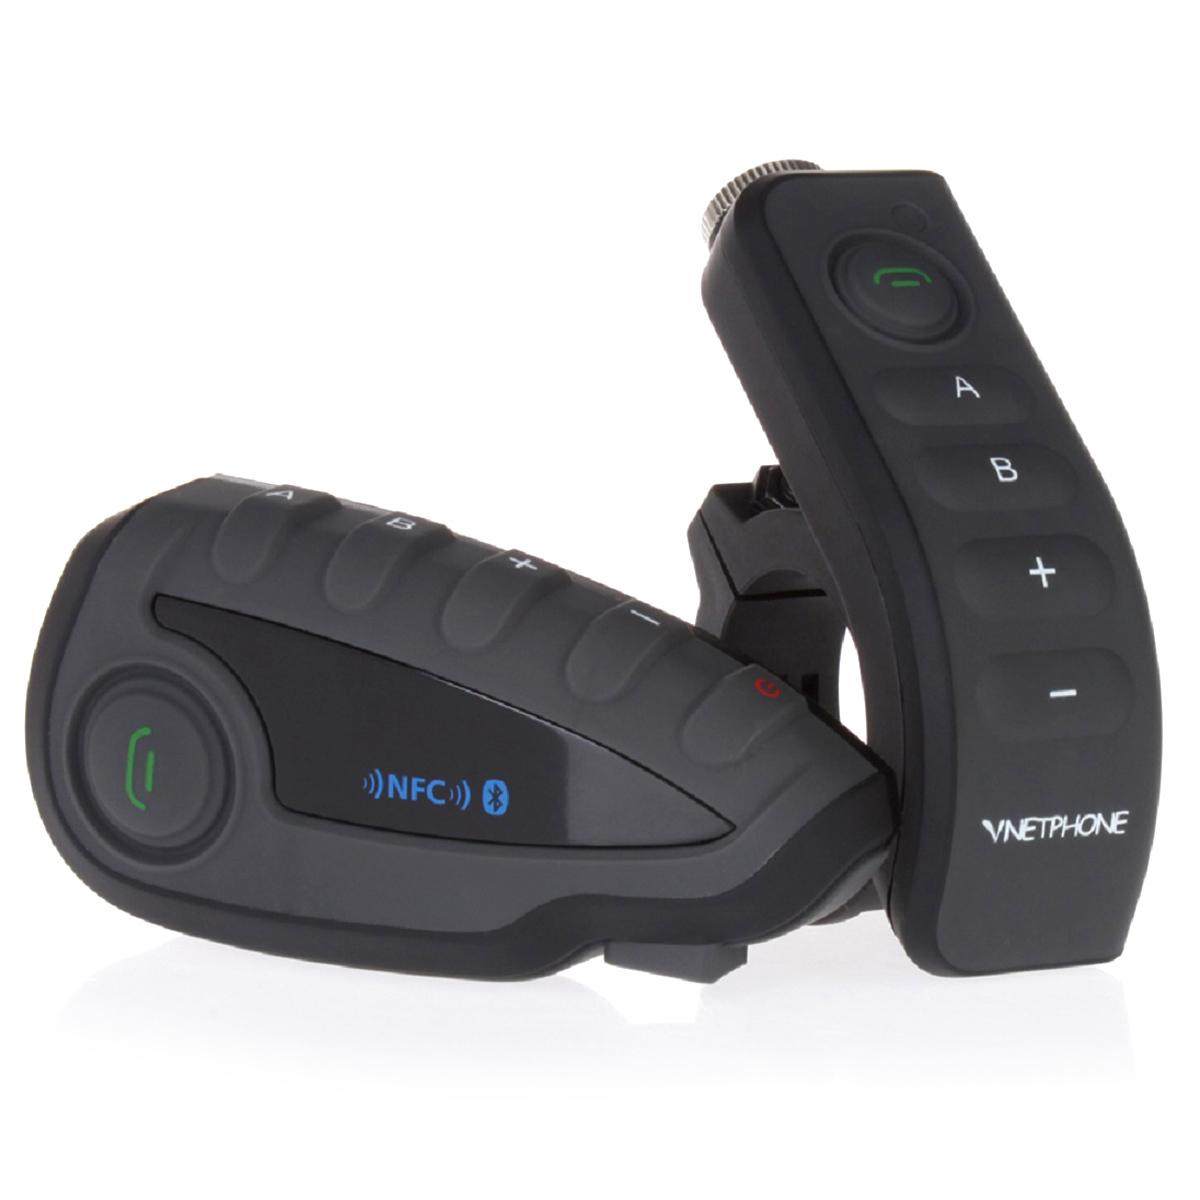 ... VNETPHONE V8-1-US 5 pengendara sepeda motor helm interkom Bluetoothdengan NFC - Internasional ...